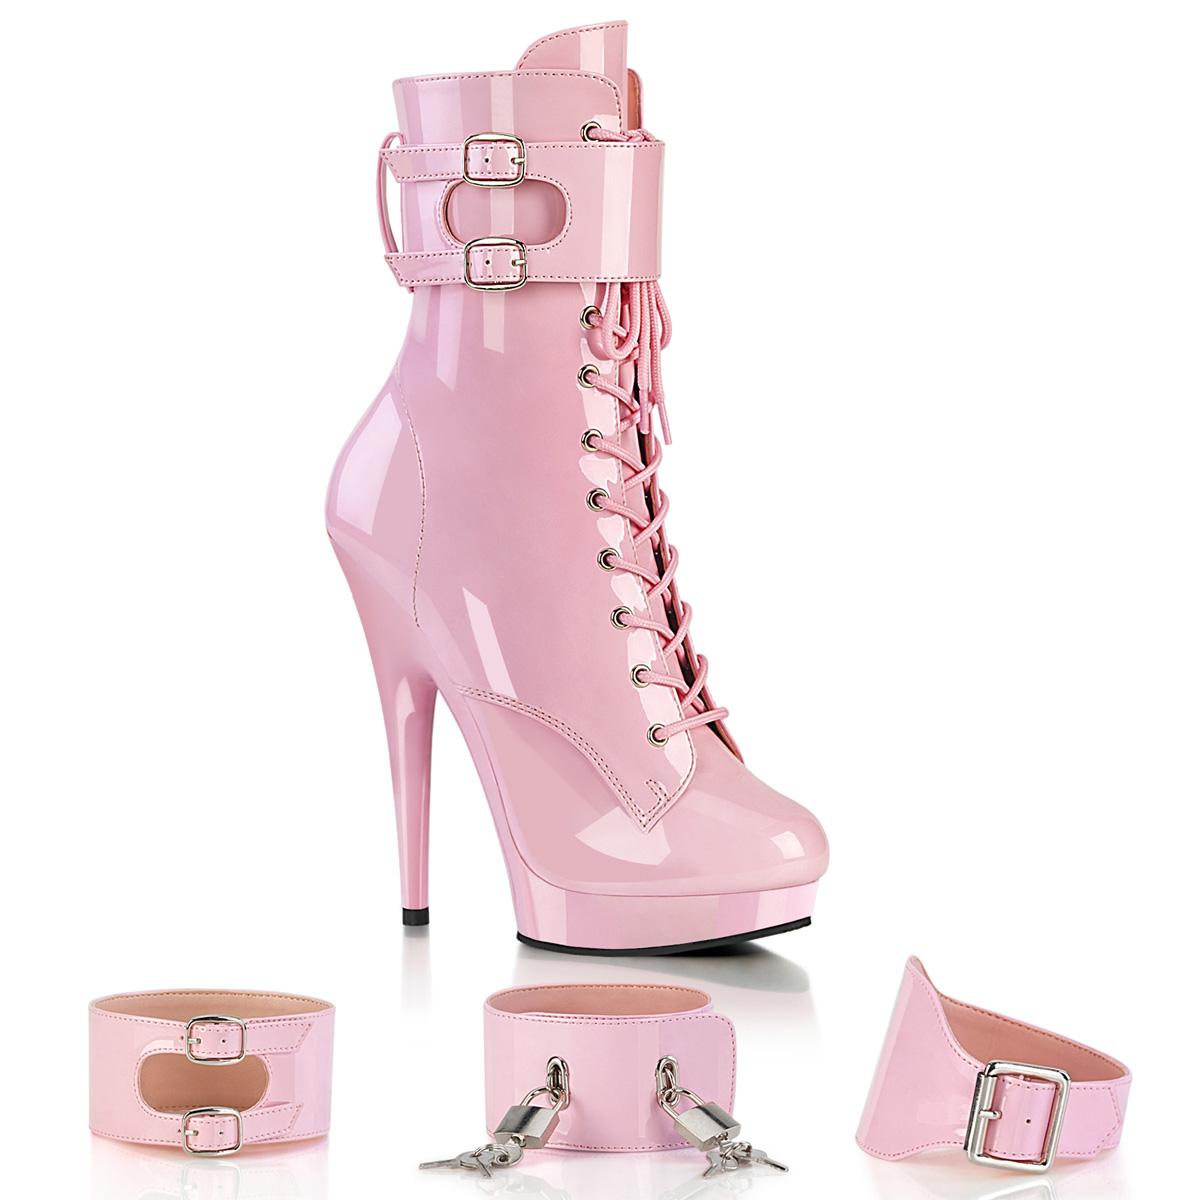 Kunstleder 12,5 cm GLORY-501F-8 Rosa high heels mules mit